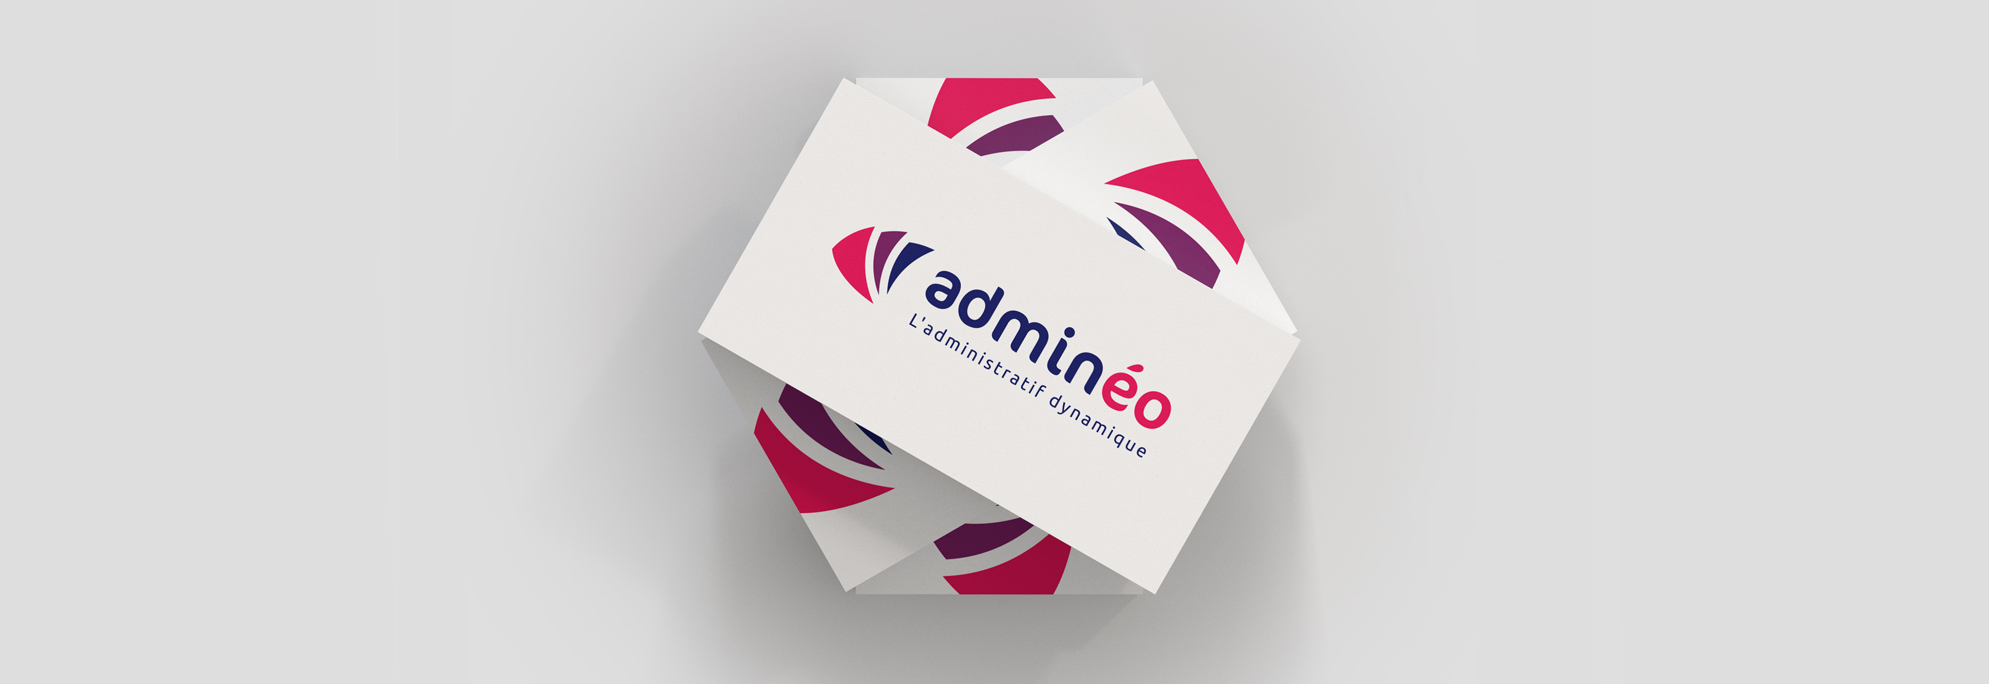 ikadia-portfolio-admineo-3